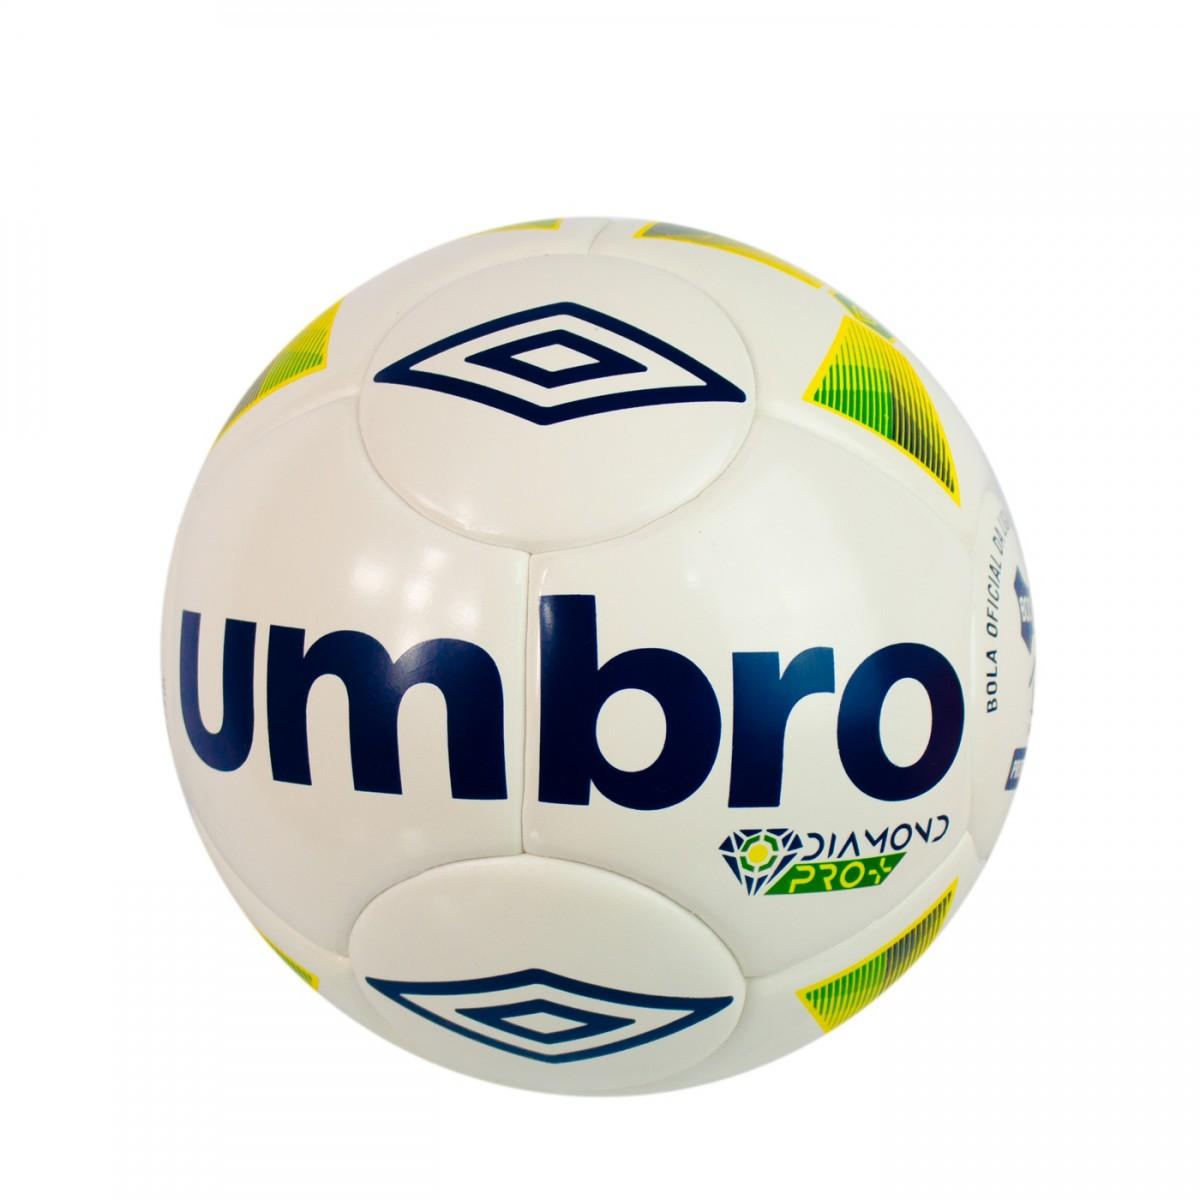 3423746cb7ed0 Bizz Store - Bola Futsal Umbro Diamond Pro+ FS Profissional